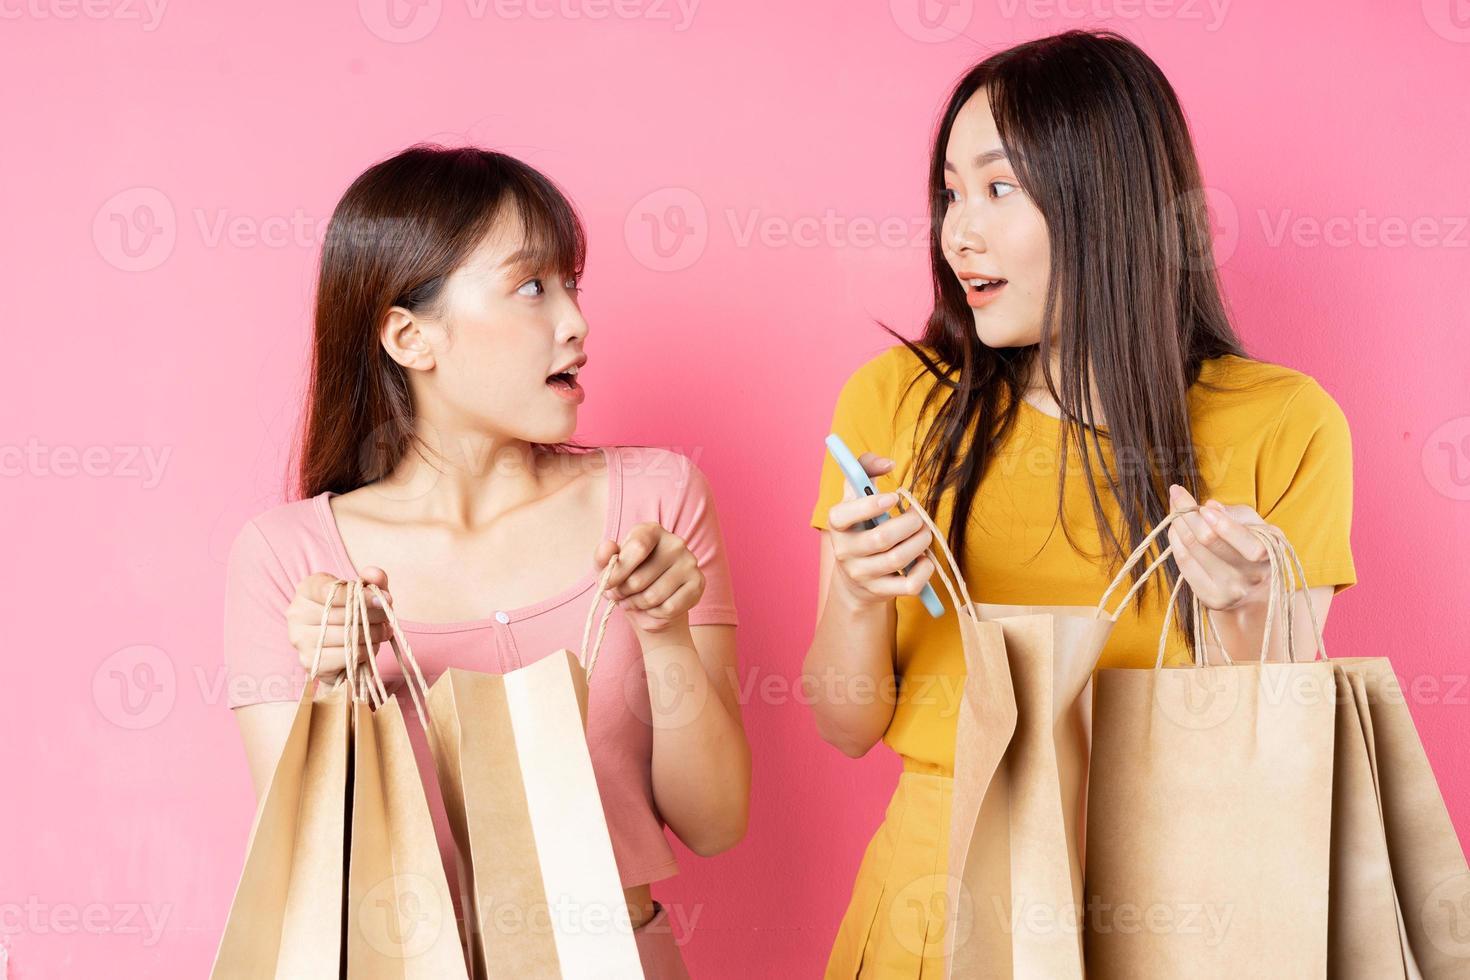 retrato, de, dos, hermoso, joven, niñas asiáticas, tenencia, muchos, bolsas de compras, en, fondo rosa foto